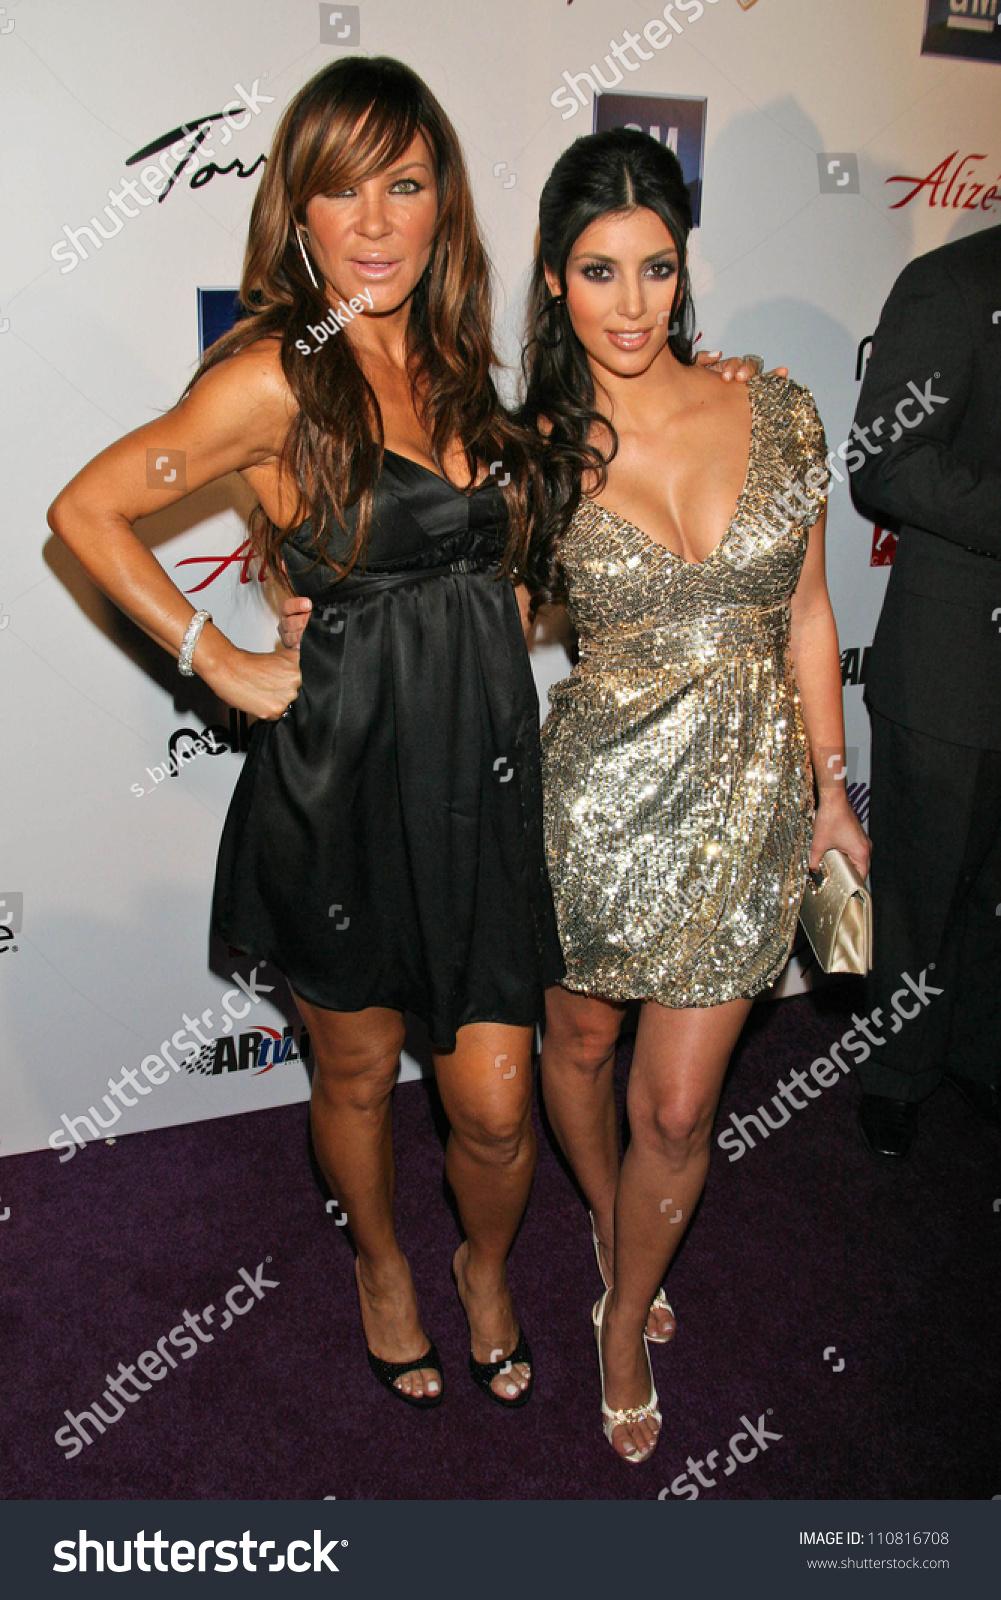 Celebrity Robin Antin nude (87 photo), Ass, Leaked, Selfie, bra 2006